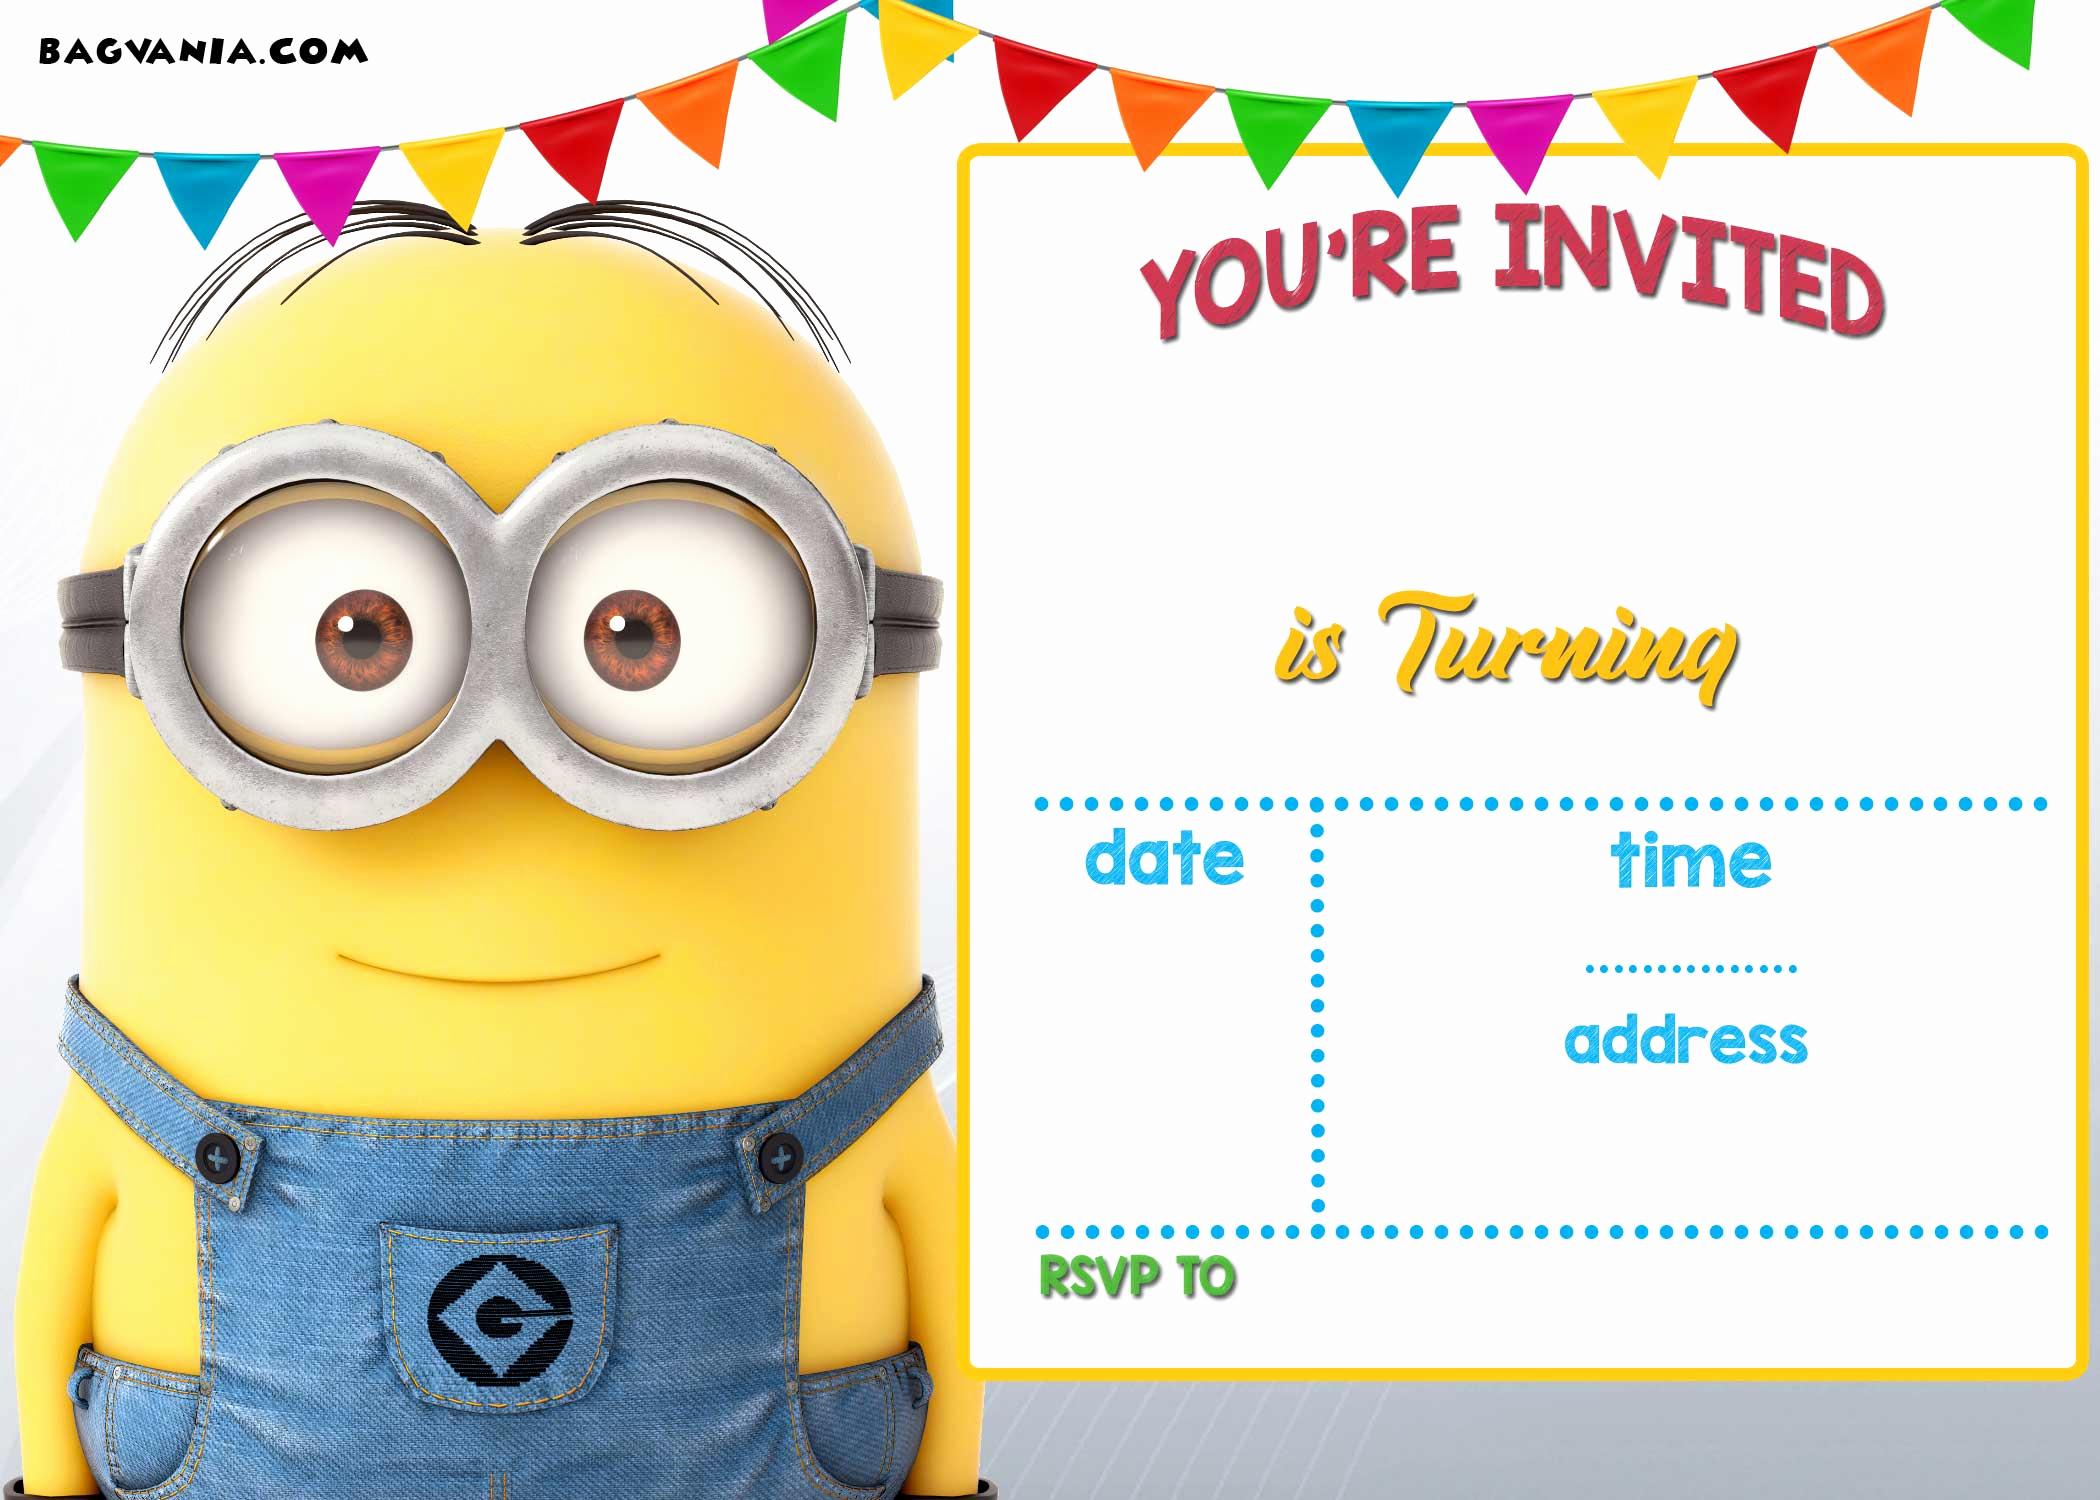 Minions Birthday Invitation Card Luxury Free Printable Minion Birthday Party Invitations Ideas